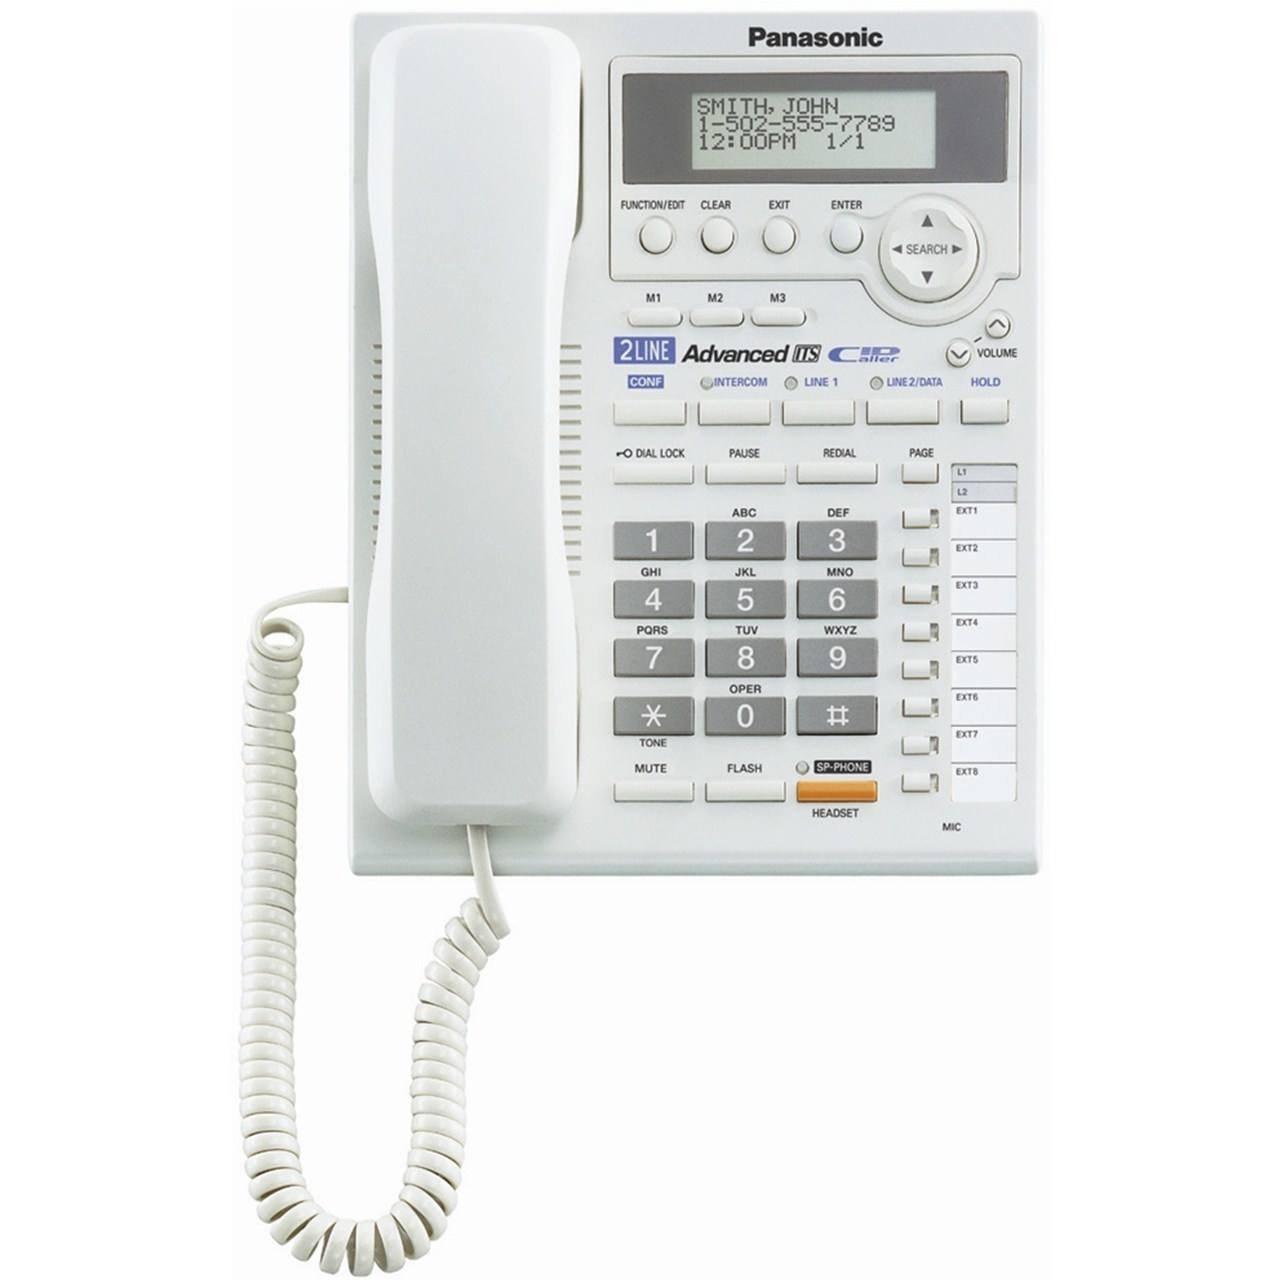 تصویر تلفن باسیم پاناسونیک مدل تی اس 3282 تلفن پاناسونیک KX-TS3282 Corded Telephone